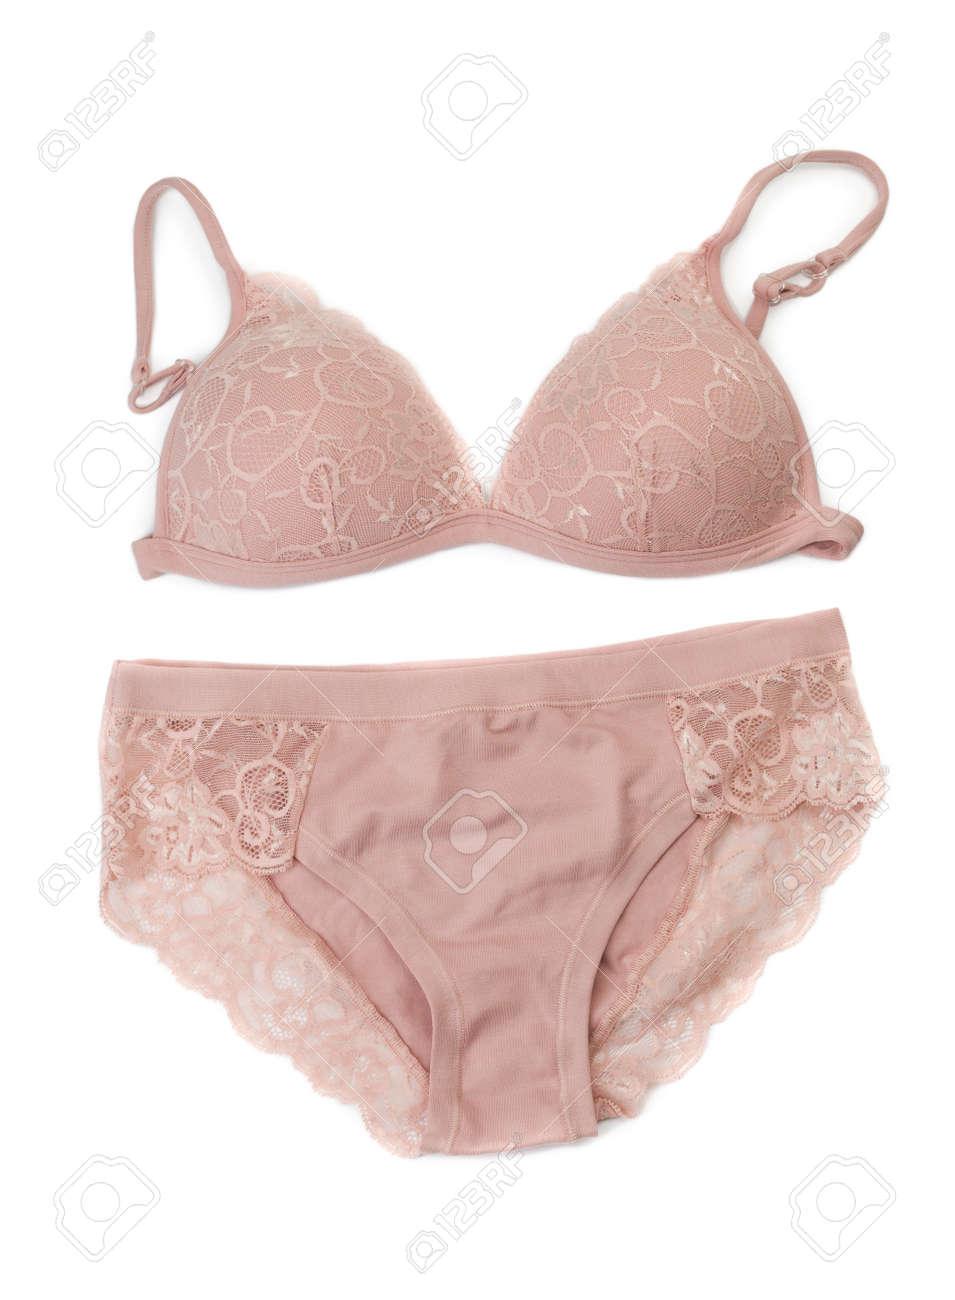 57d0619bd Beige set of lingerie. Isolate on white. Stock Photo - 31075985